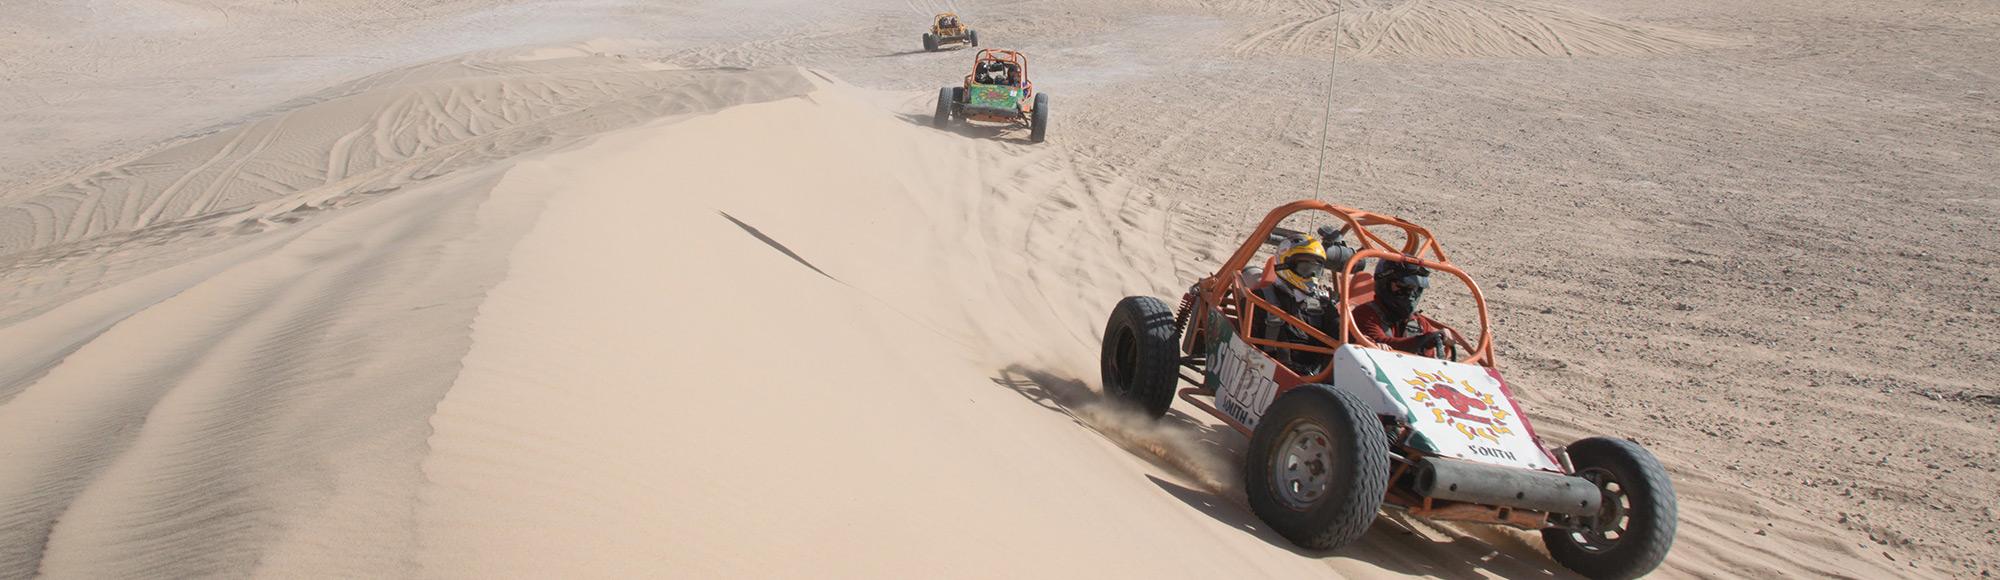 vegas sand dune buggies